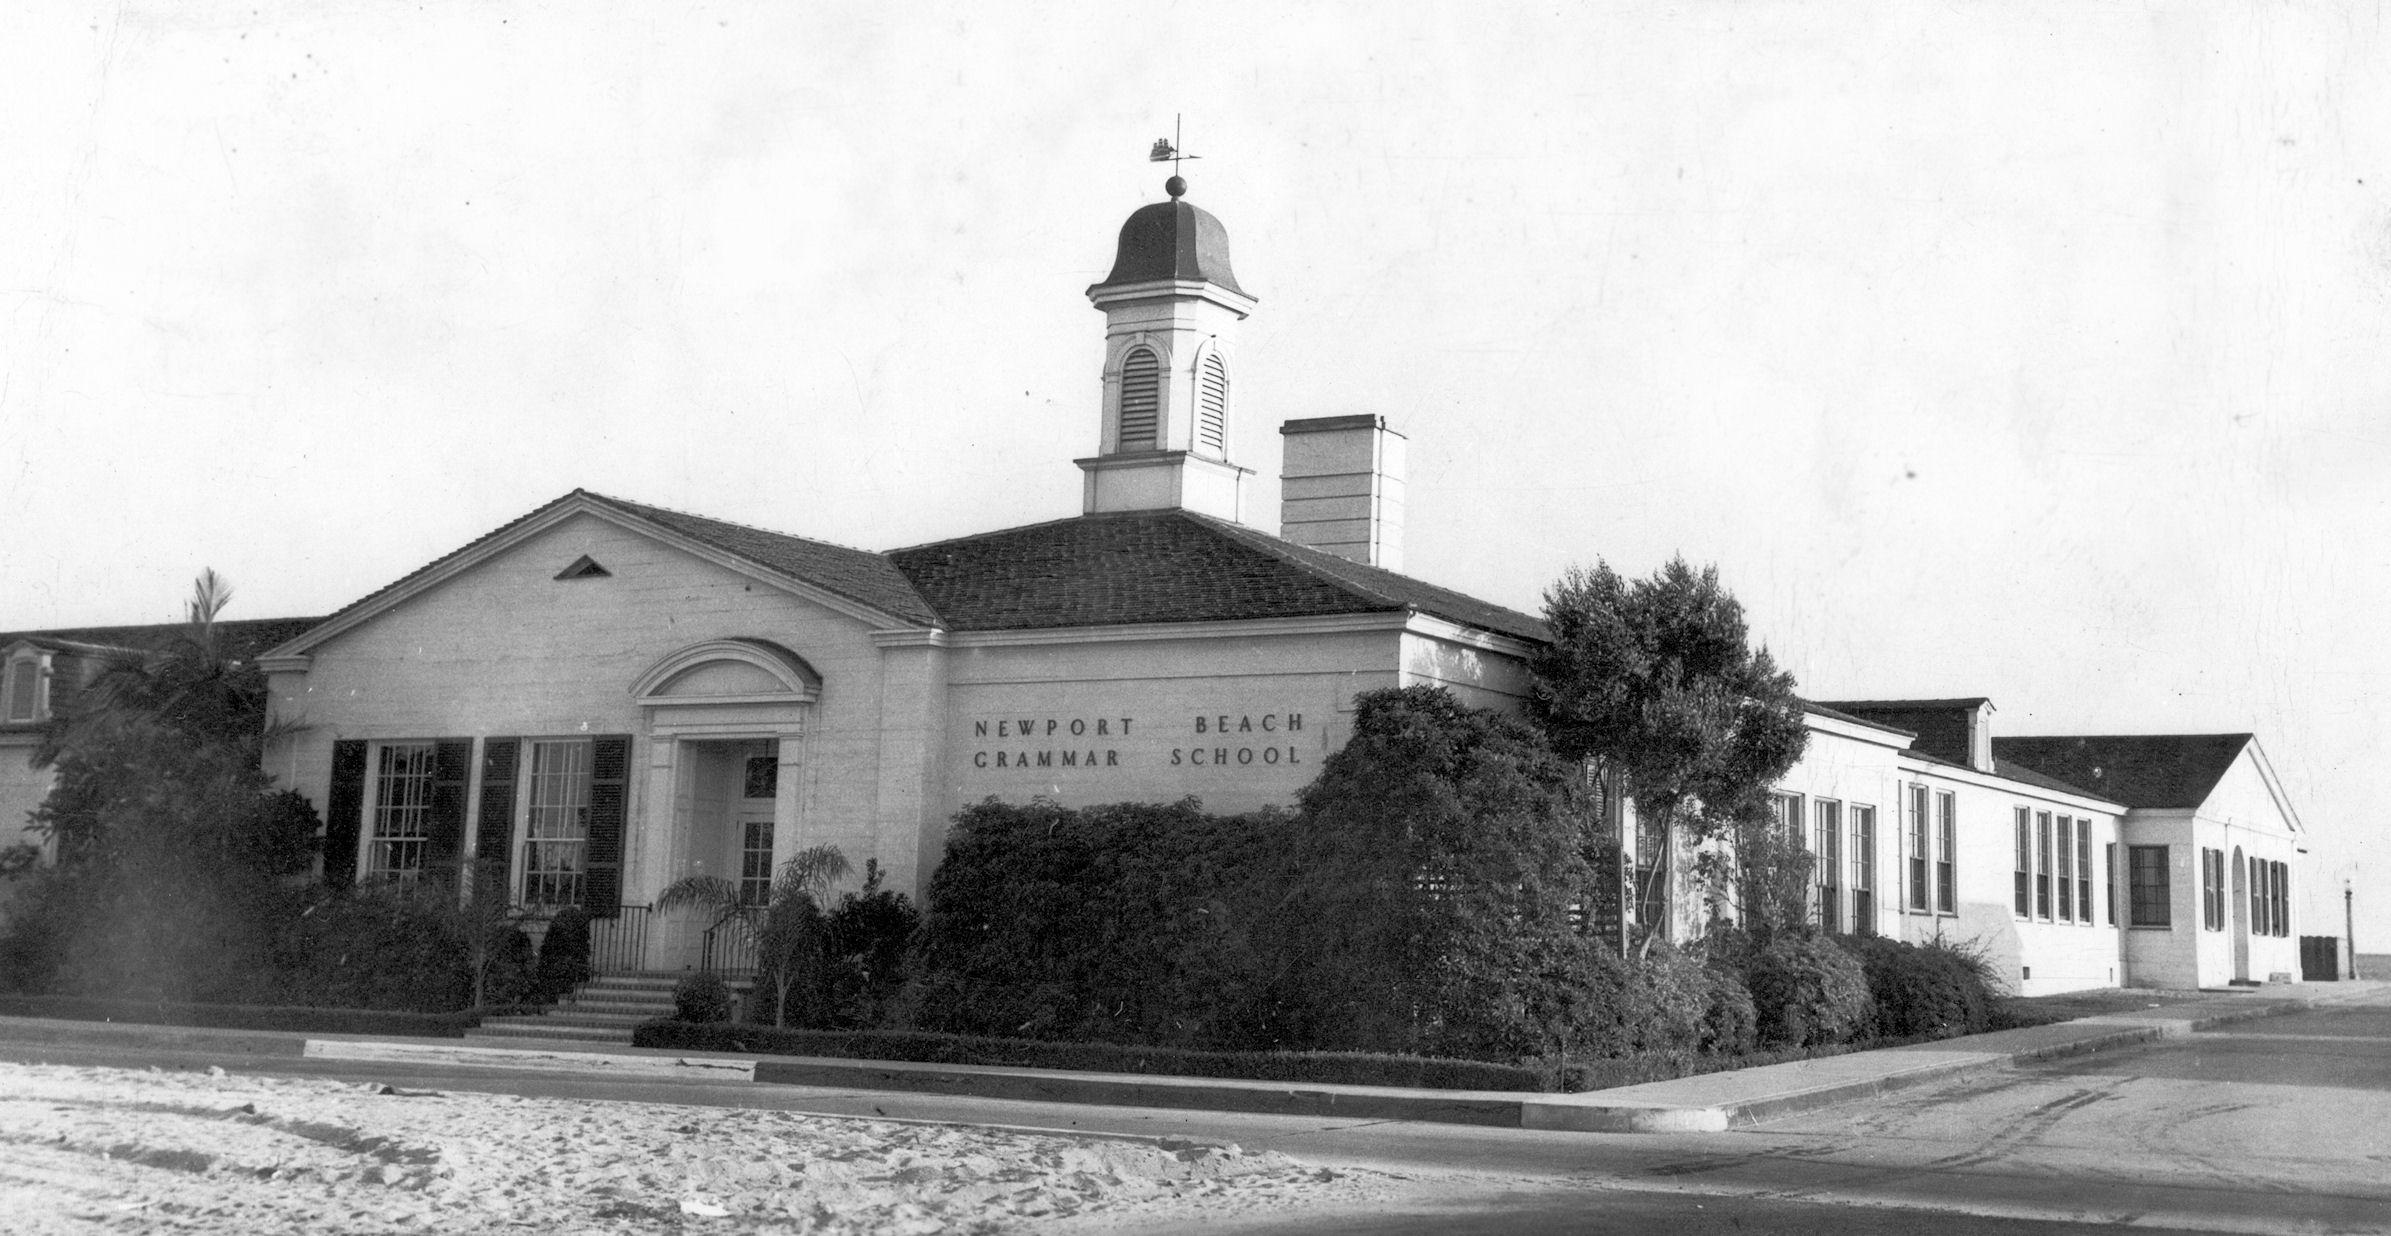 Newport Beach Grammar School, ca 1947.